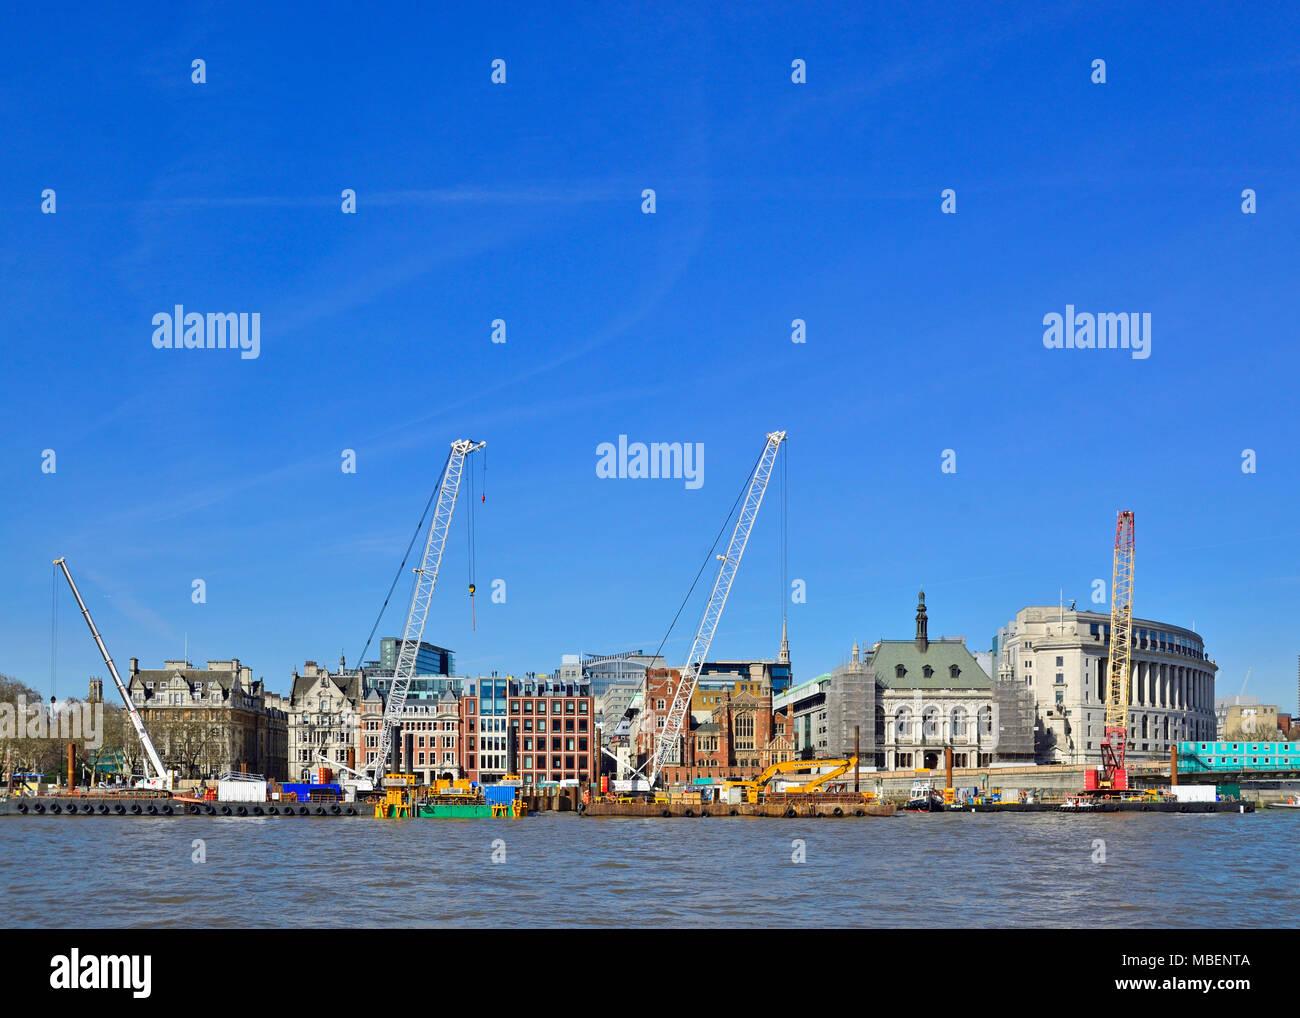 London, England, UK. Construction cranes on the Victoria Embankment - Stock Image